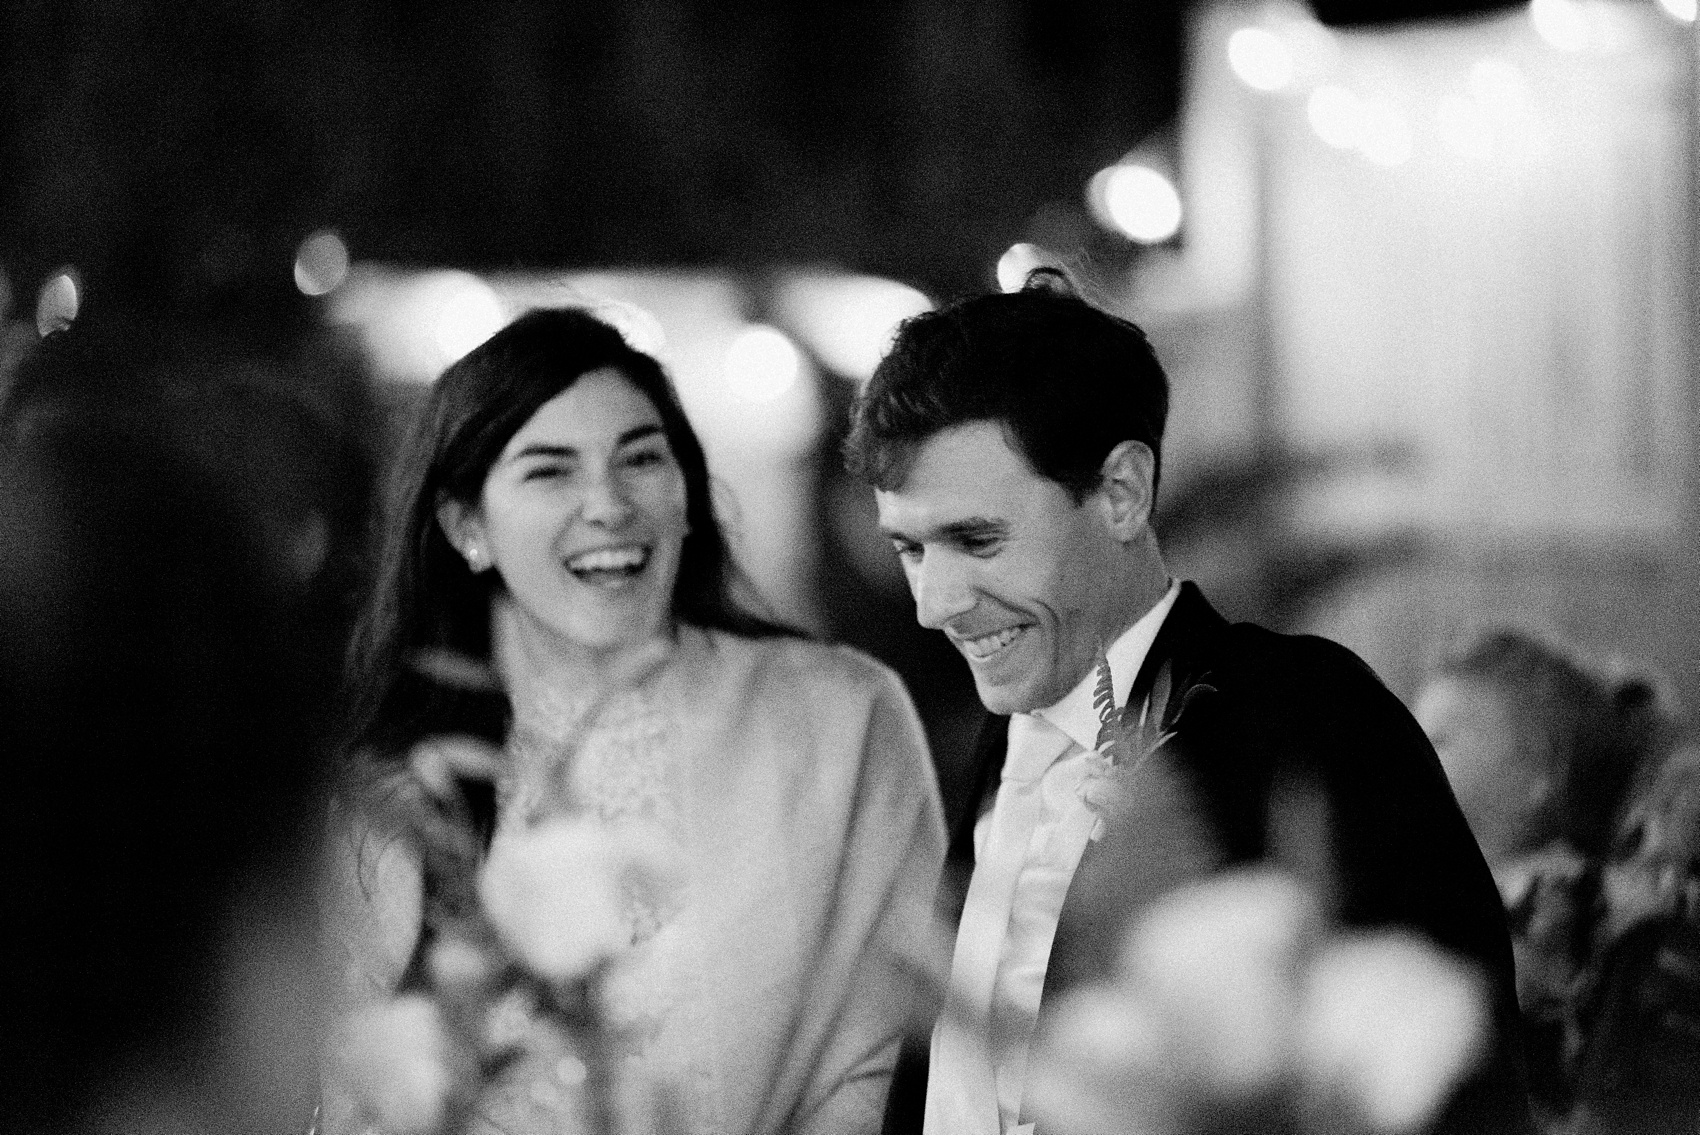 outerbanks_wedding_photographer_1330.jpg